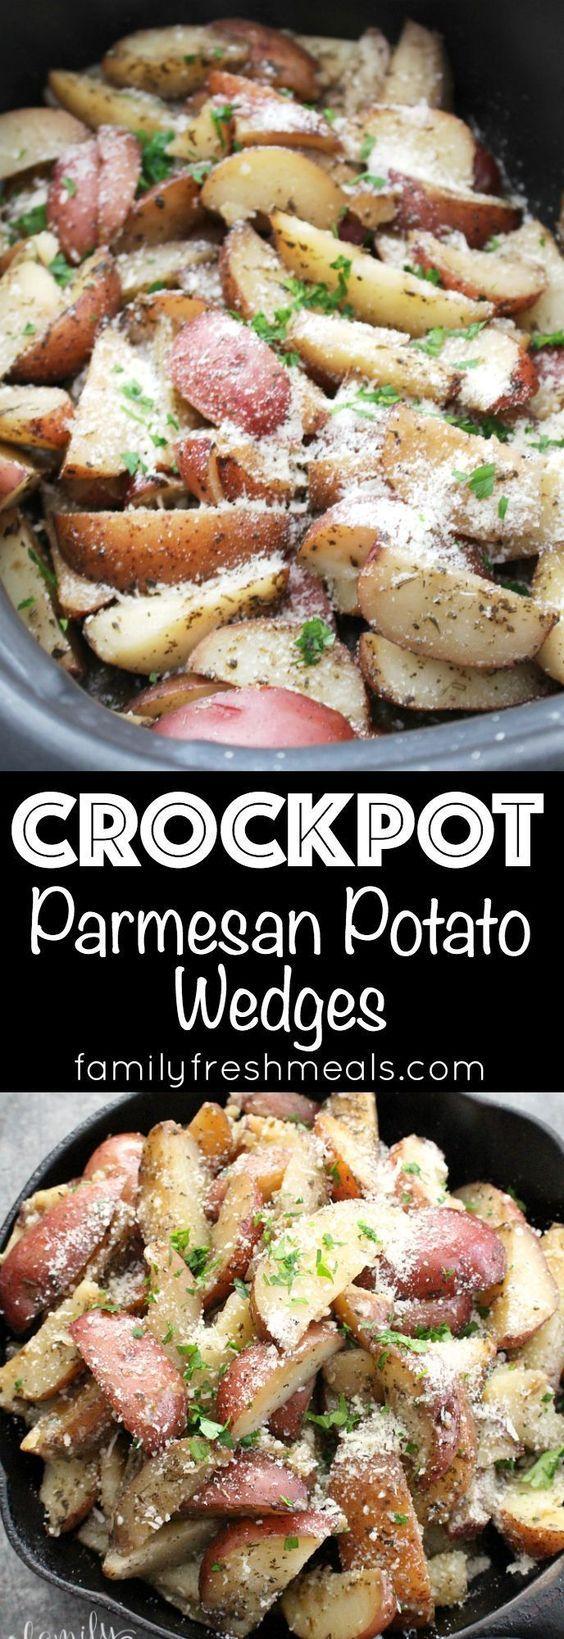 Crockpot Parmesan Potatoes yummy recipe #crockpot #slowcooker #potatoes